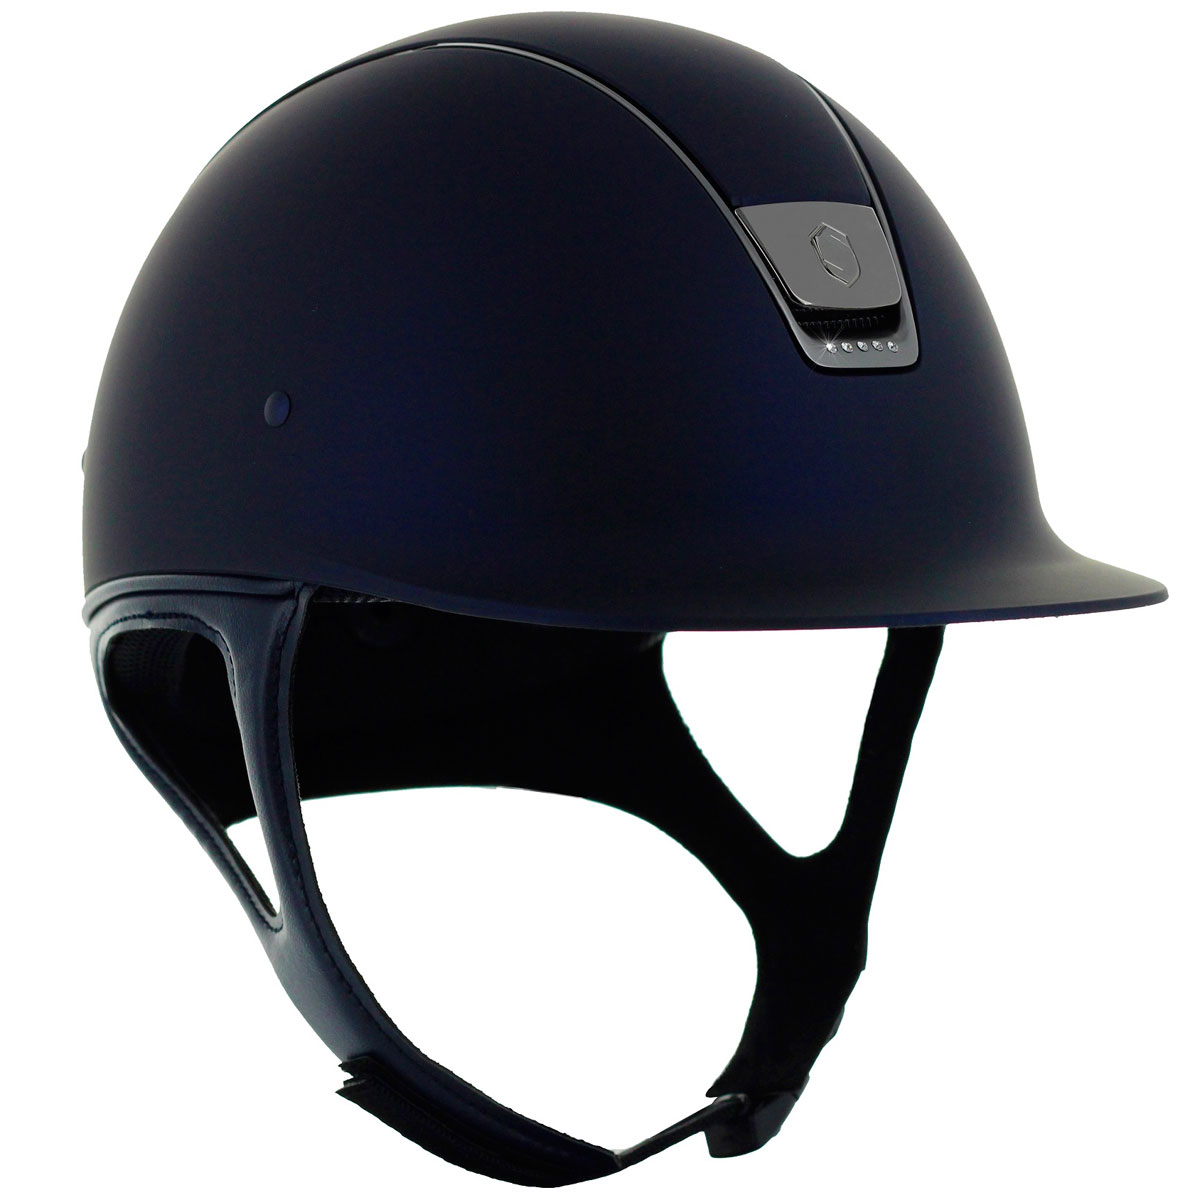 Samshield Shadow Matt Swarovski Helmet